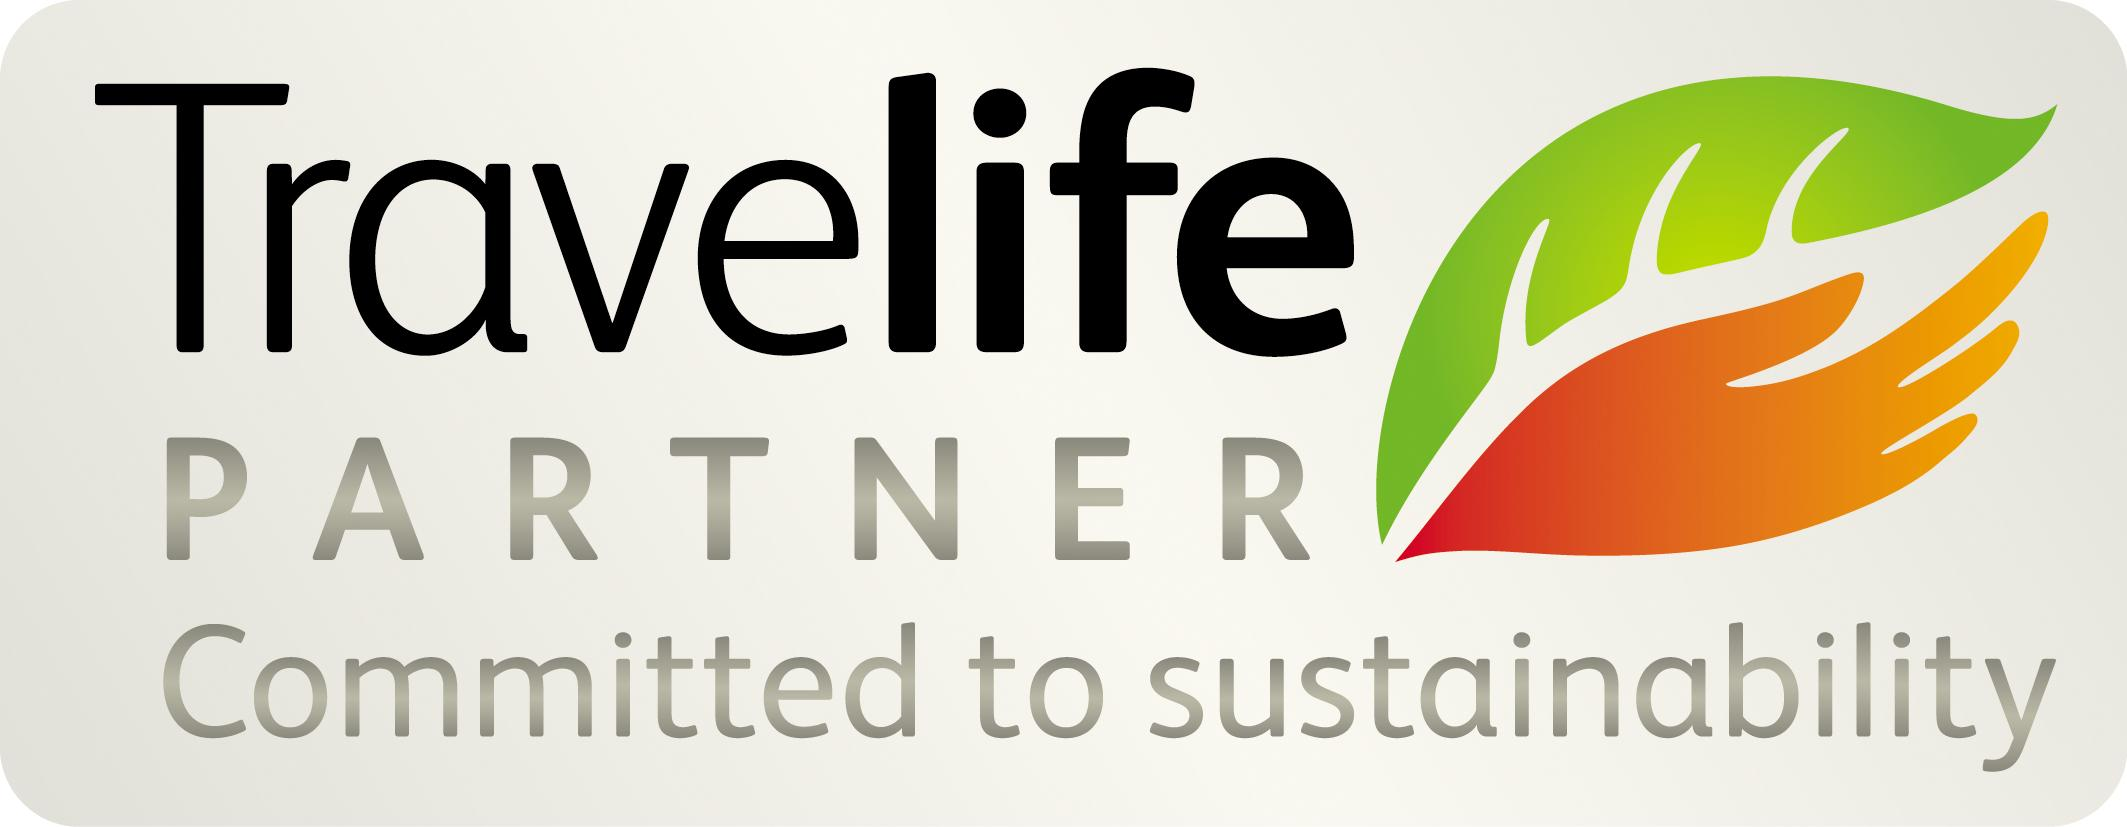 Travelife partner